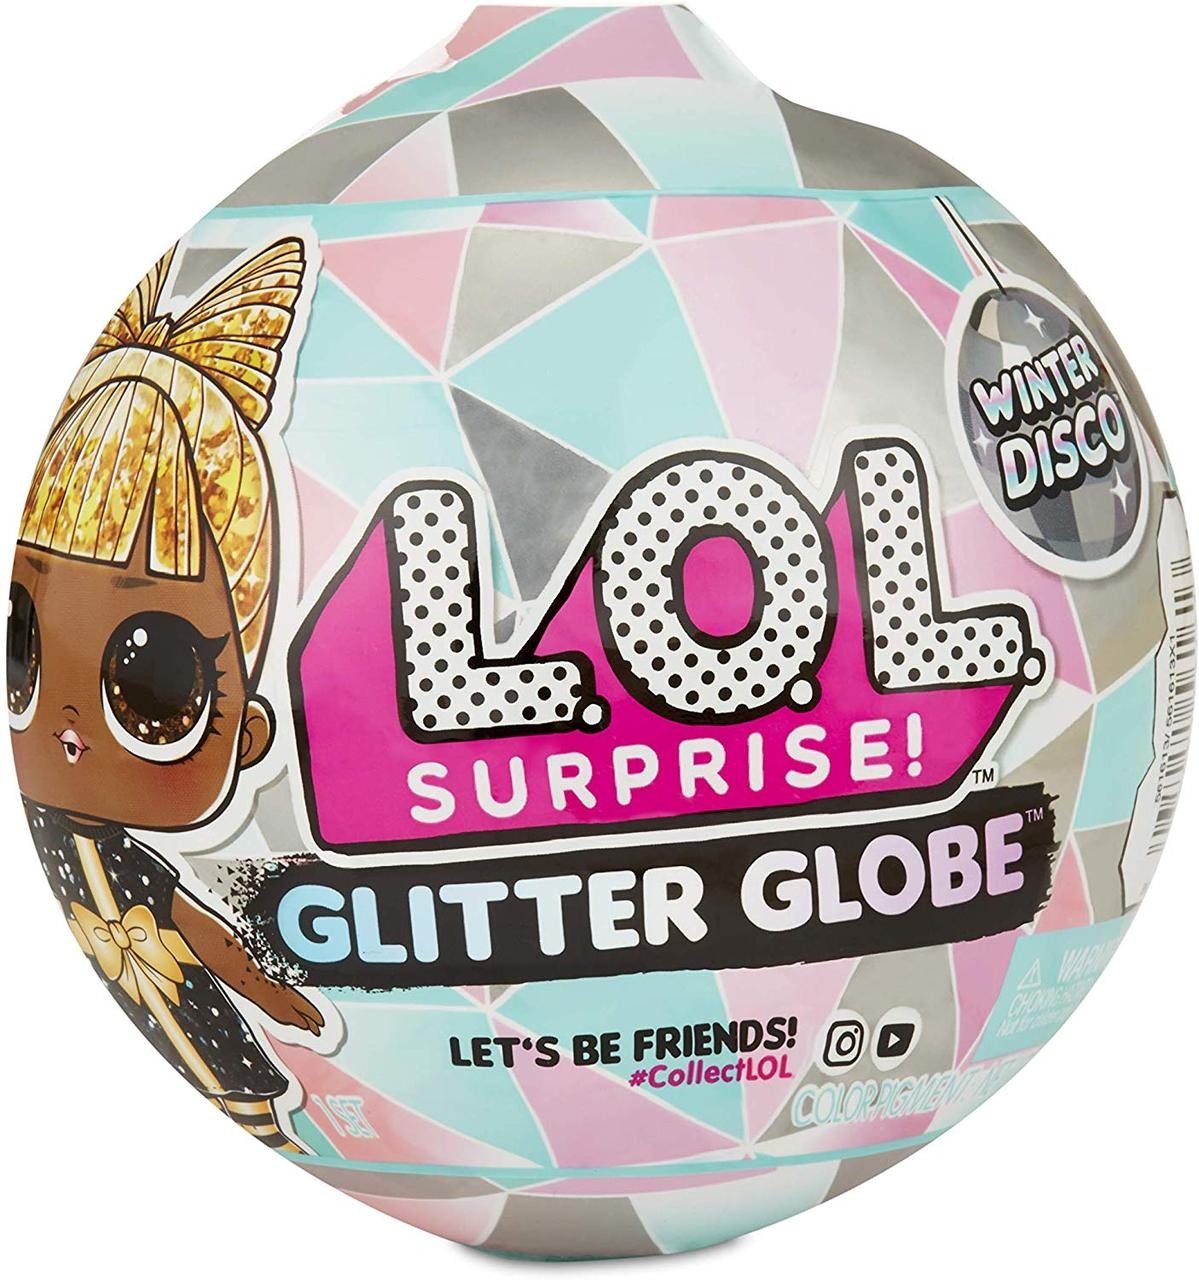 Лялька ЛОЛ Блискучий Куля L. O. L. Surprise! Glitter Globe Doll Winter Disco